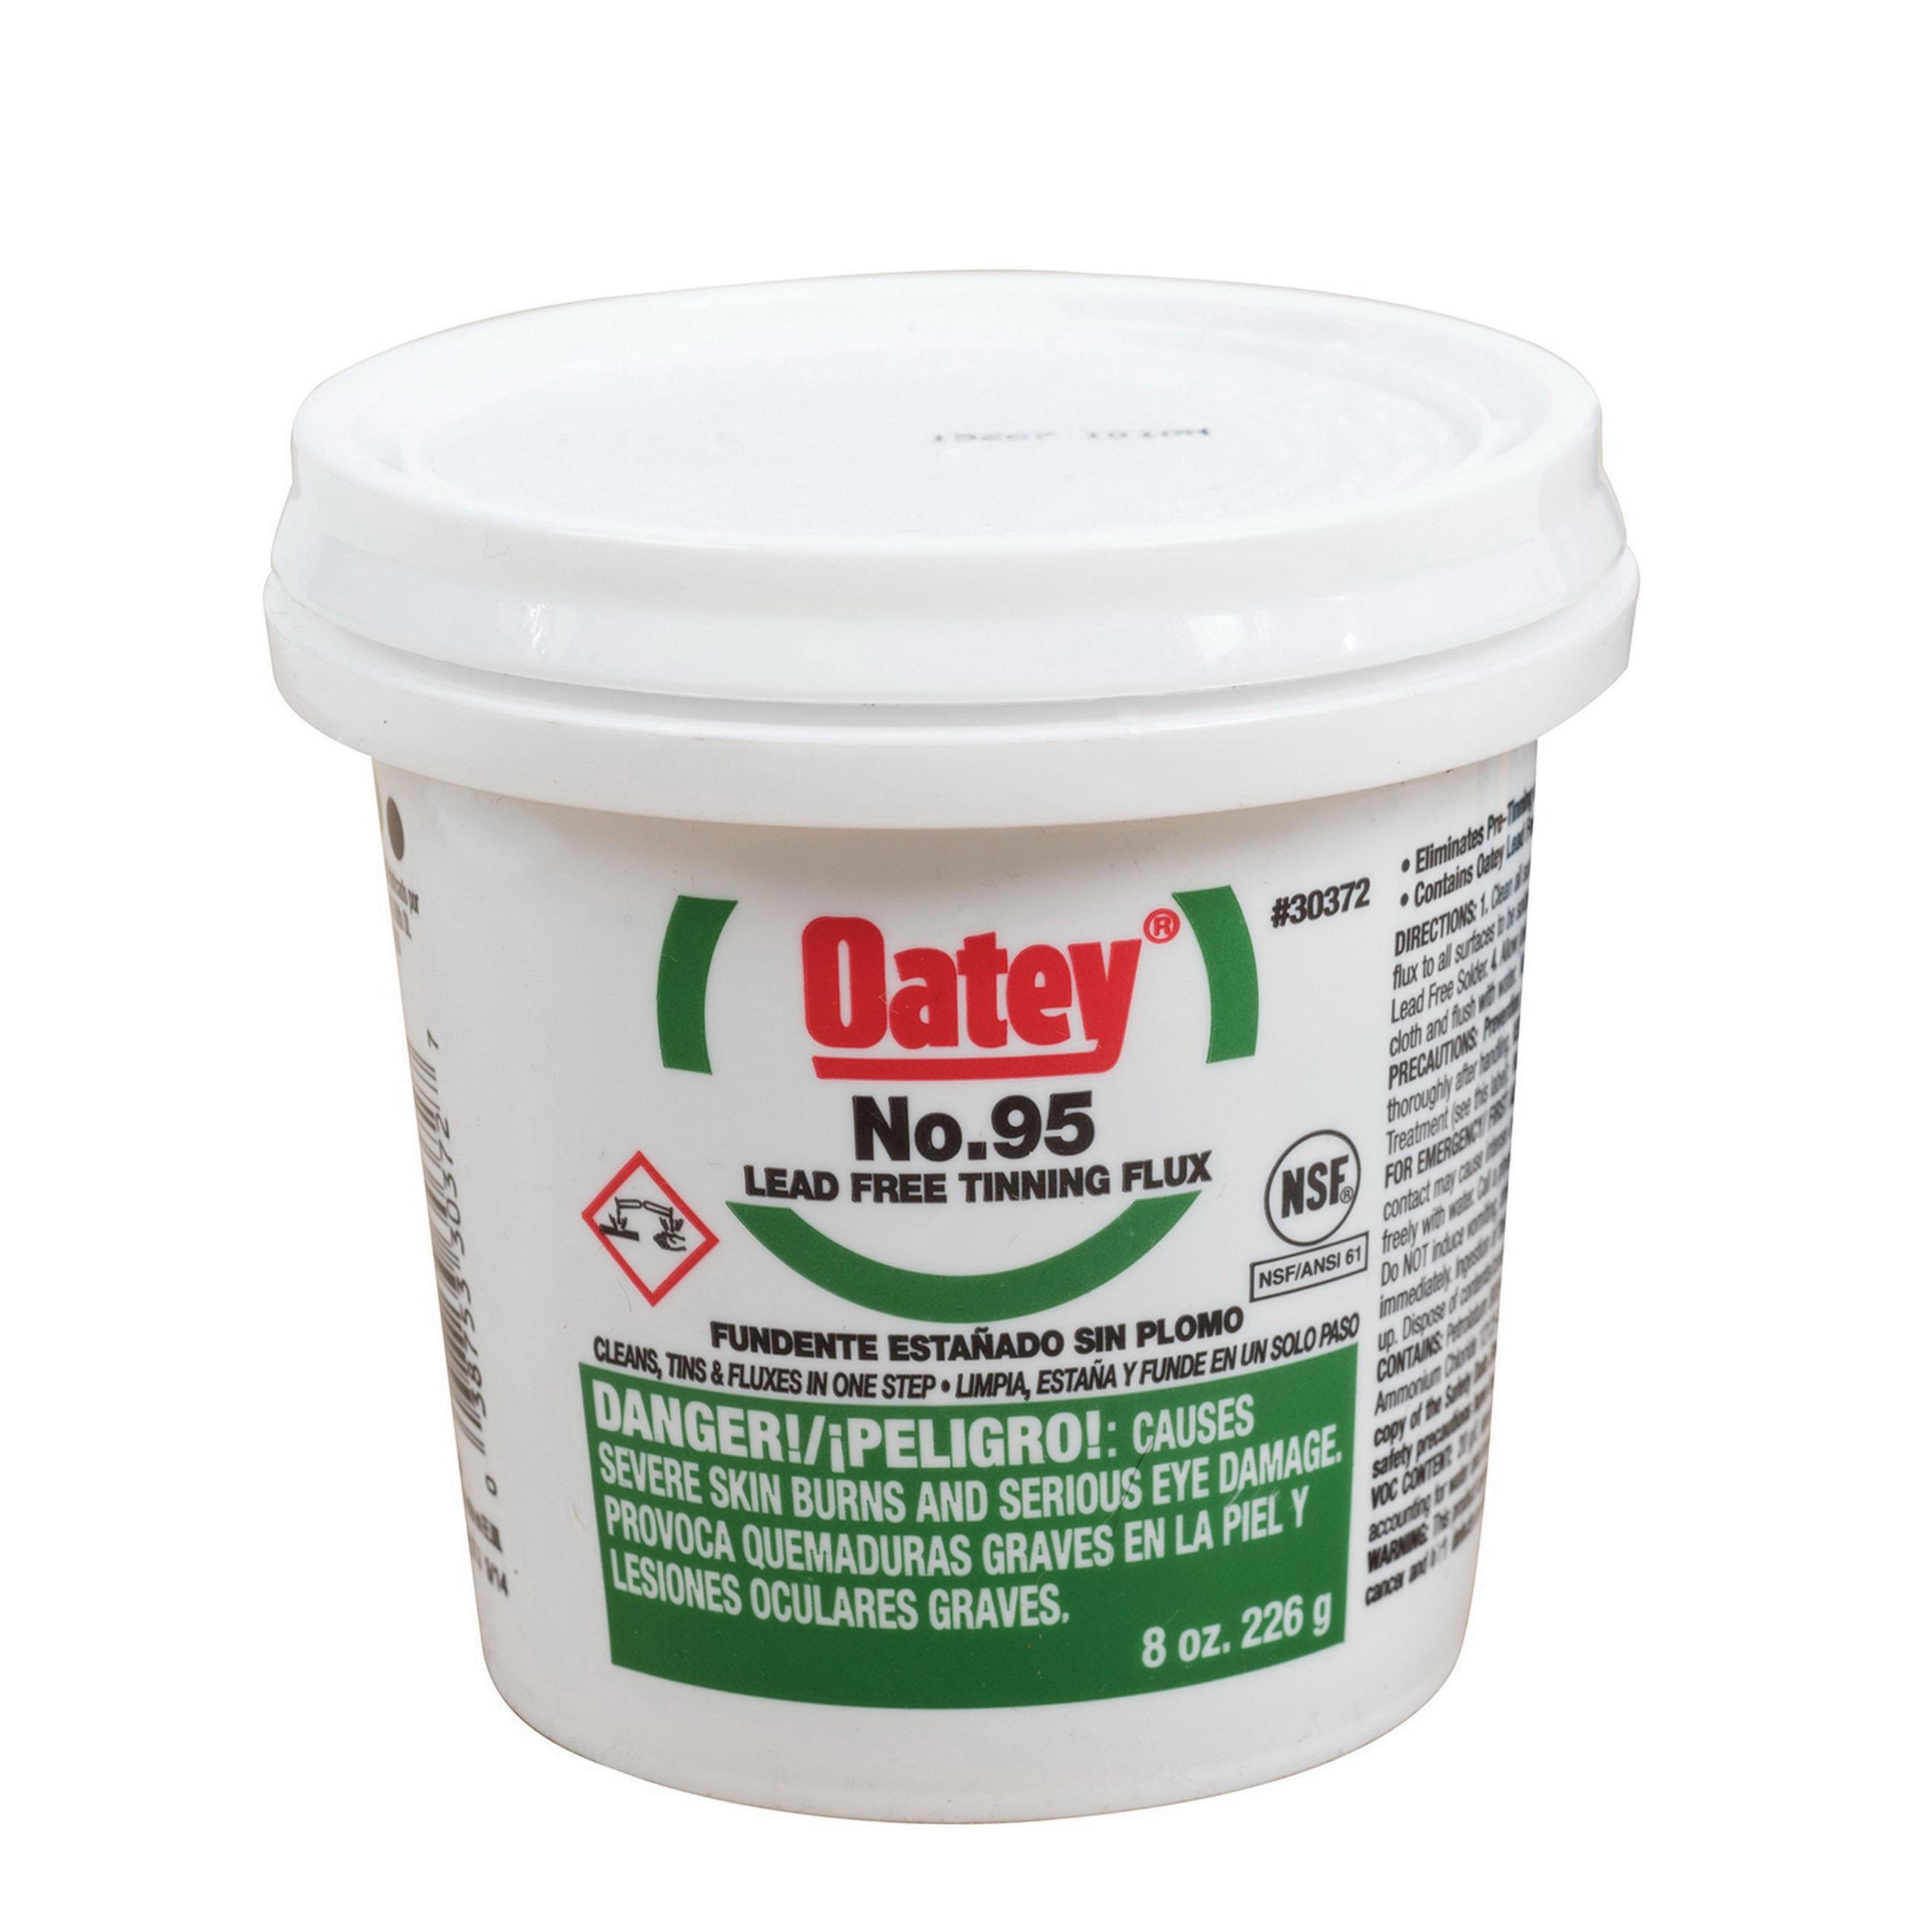 Oatey® 30372 Tinning Flux, Yellow, 8 oz Pail, 400 - 700 deg F